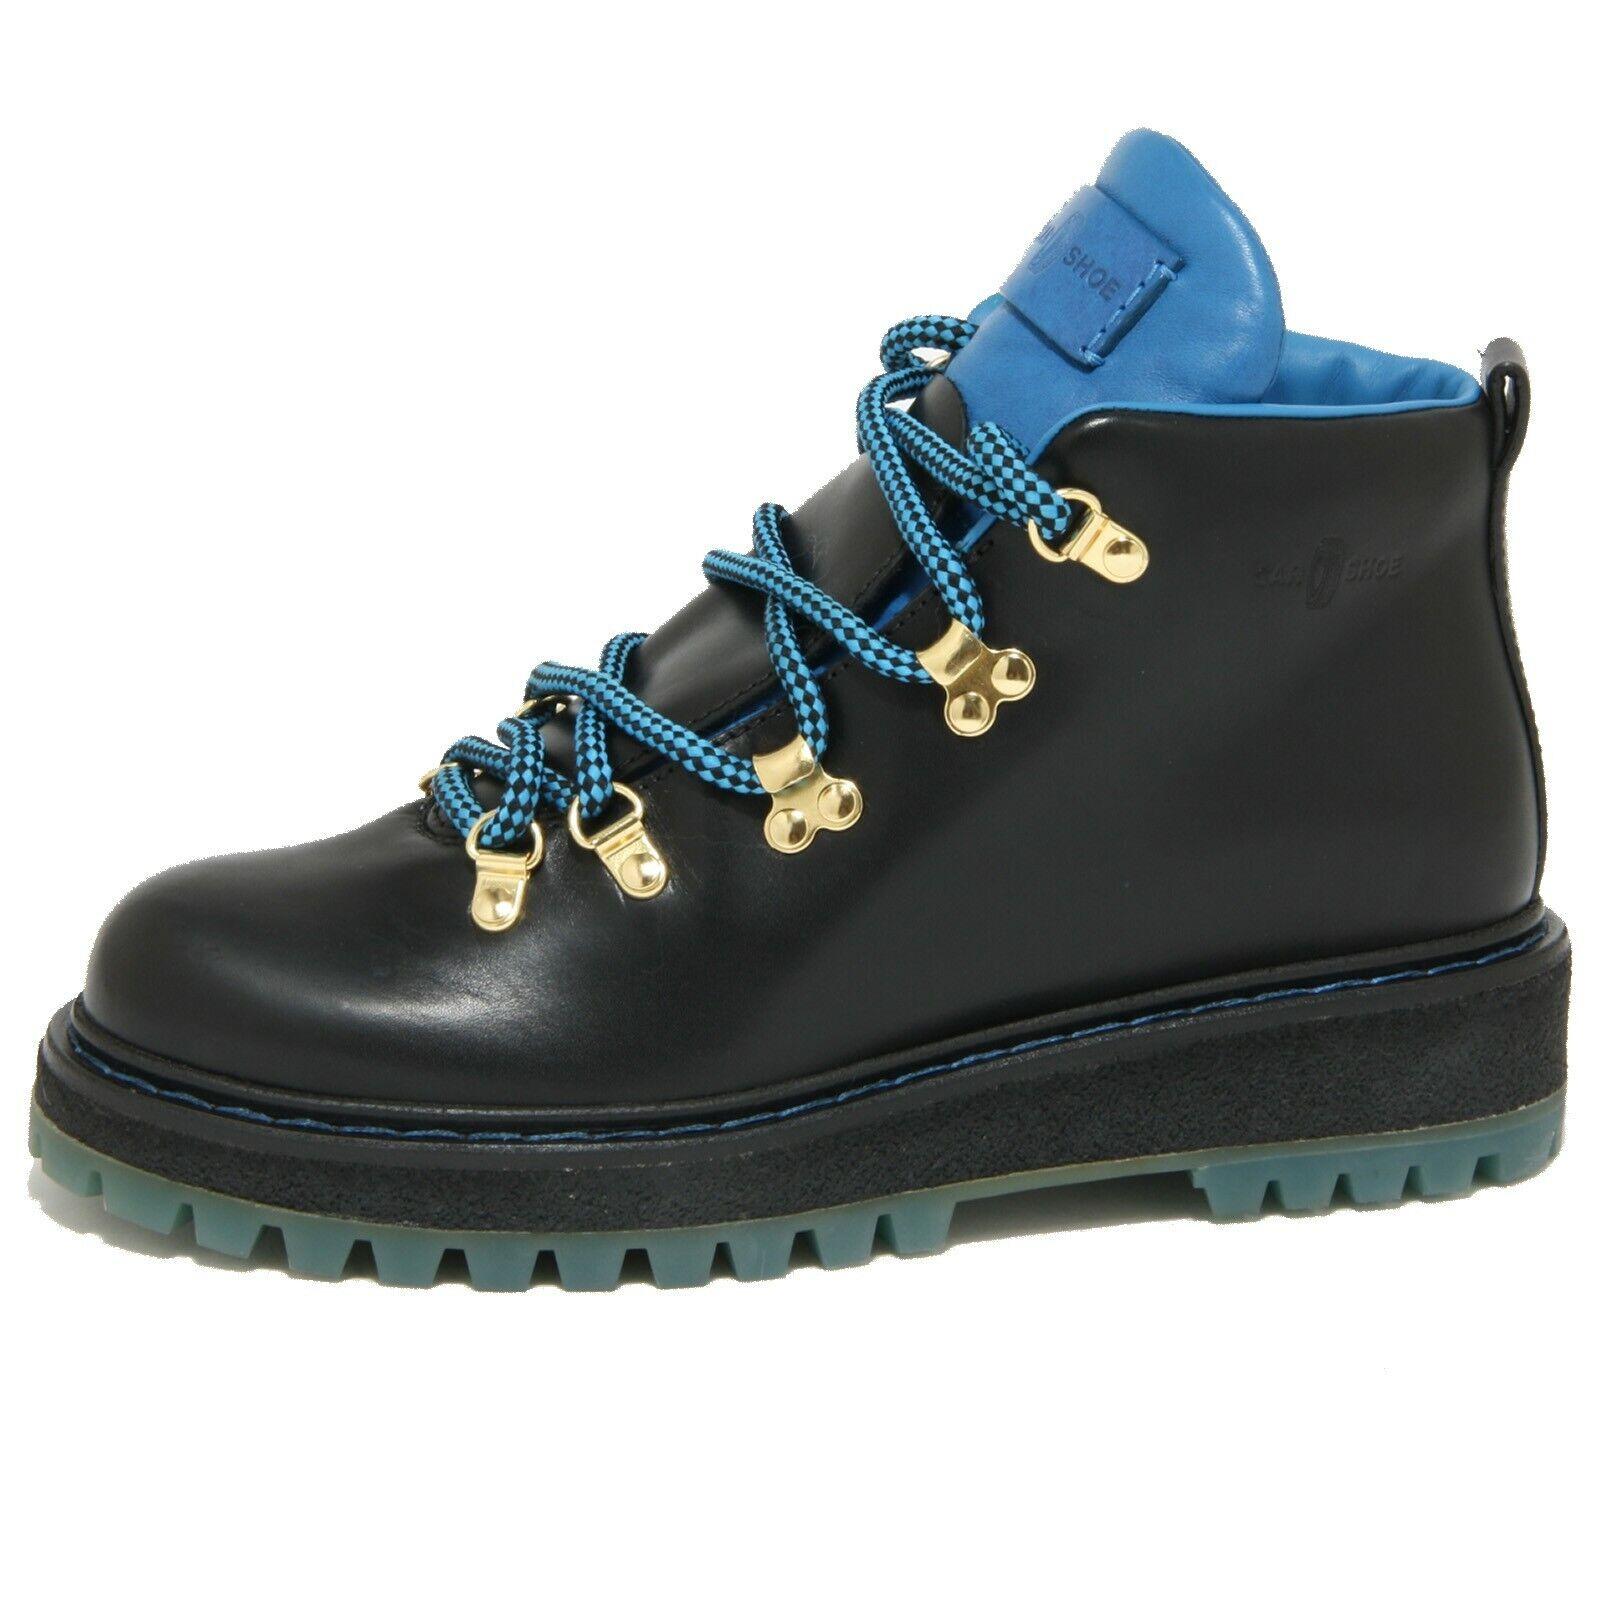 1756o scarponcino car car car zapatos Pull Up trekking stivaletto mujer botas mujer  salida para la venta